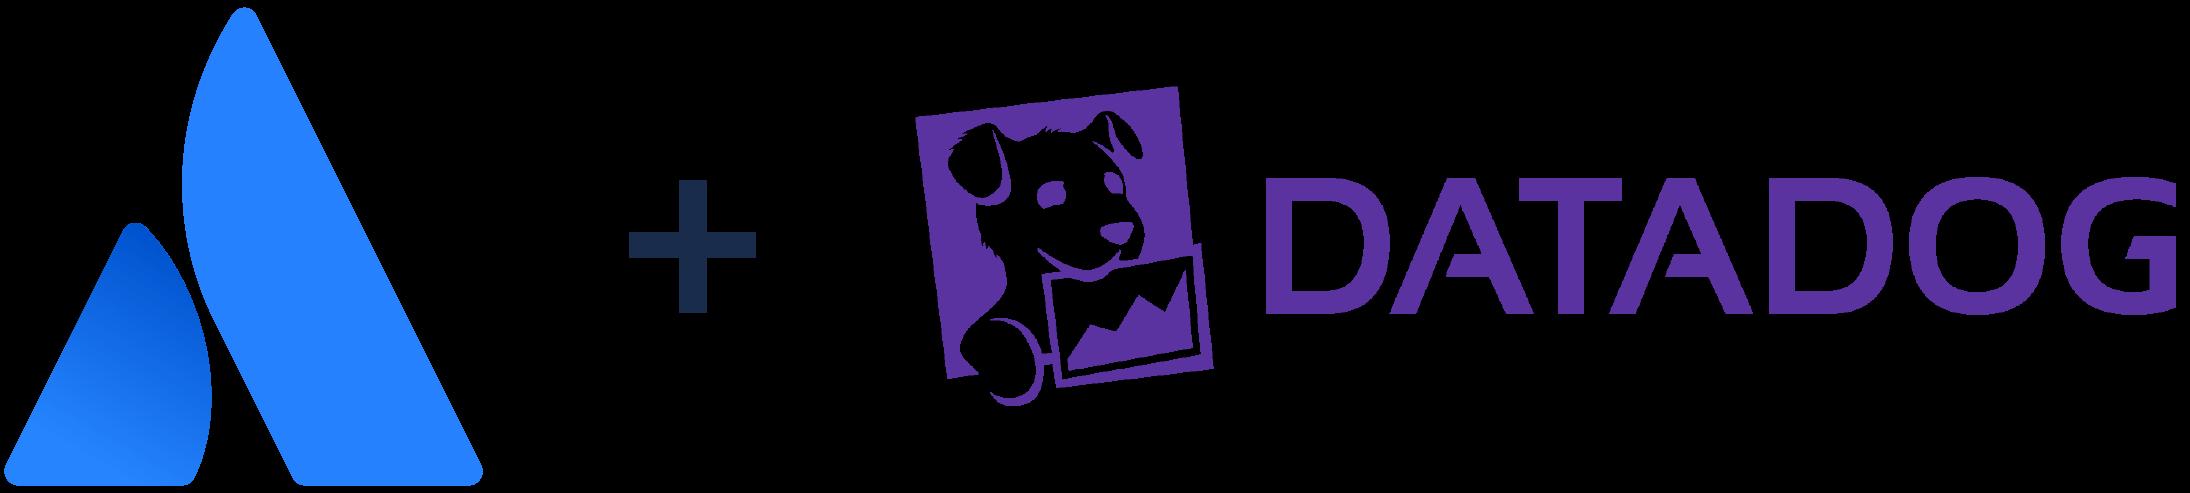 Логотип Atlassian+ логотип Datadog